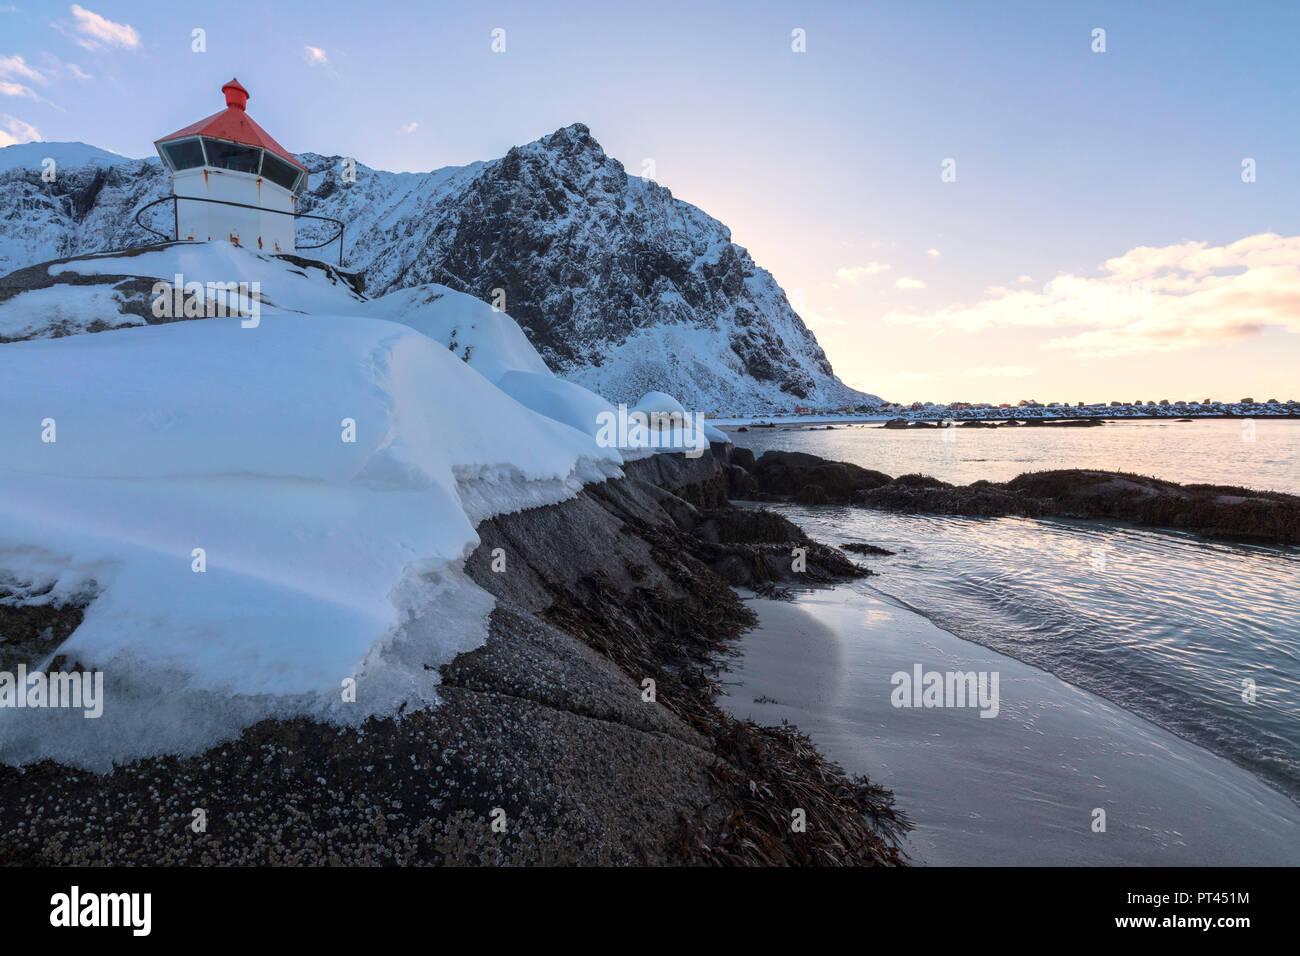 Lighthouse, Eggum, Vestvagoy, Lofoten Islands, Norway - Stock Image